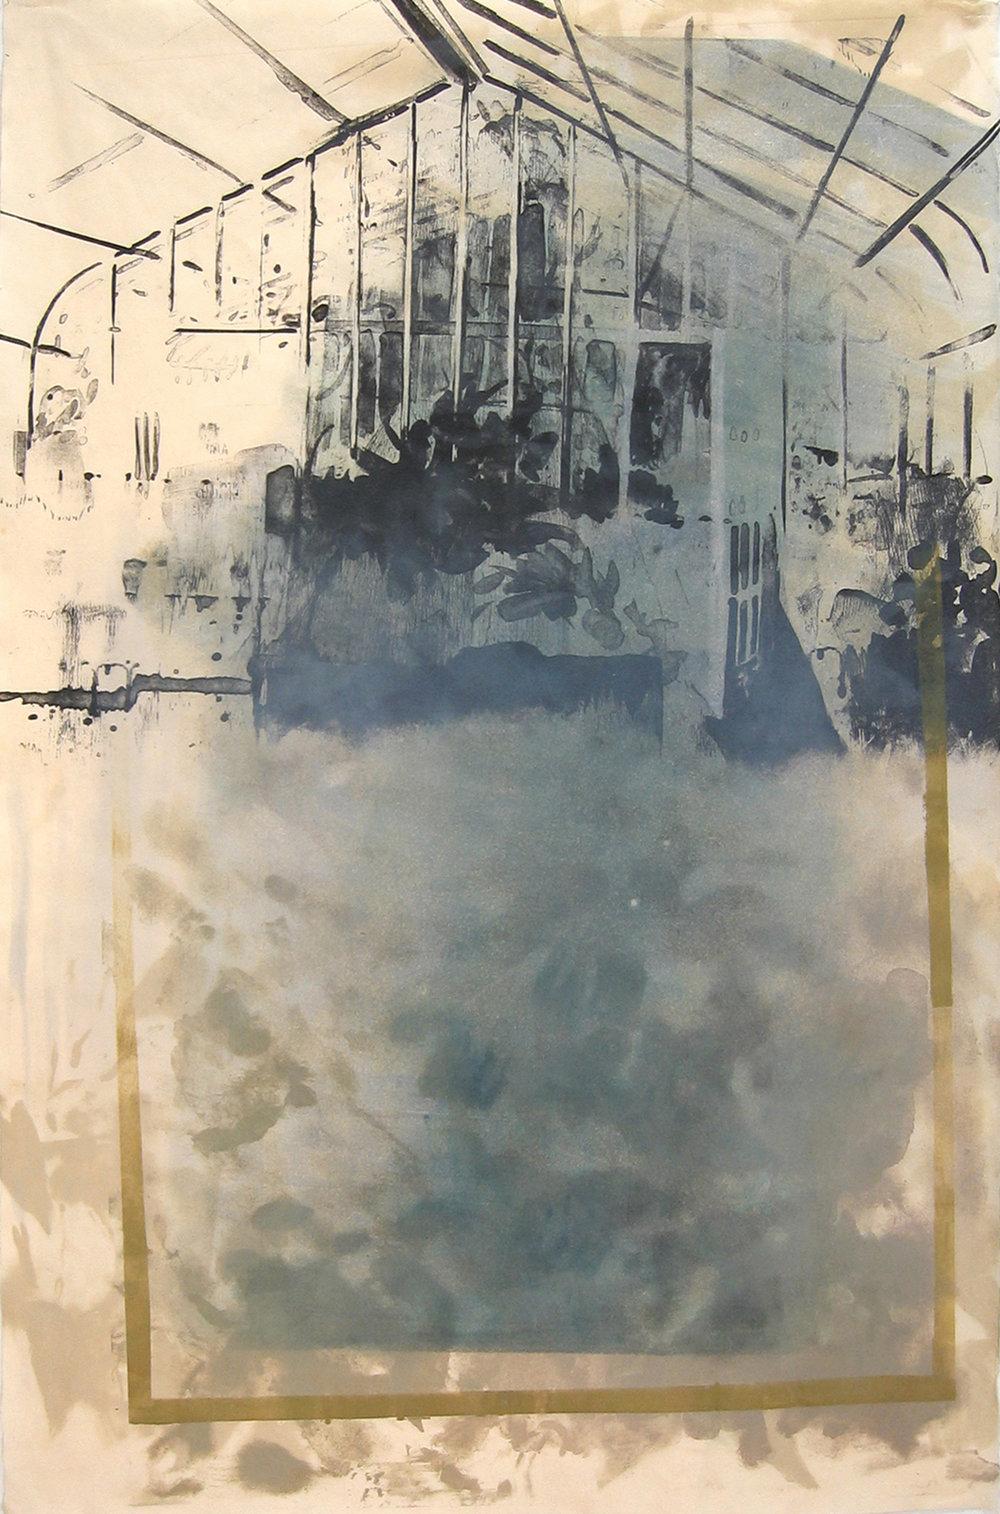 """Stone Greenhouse II/III"" by Joel Janowitz 2005"